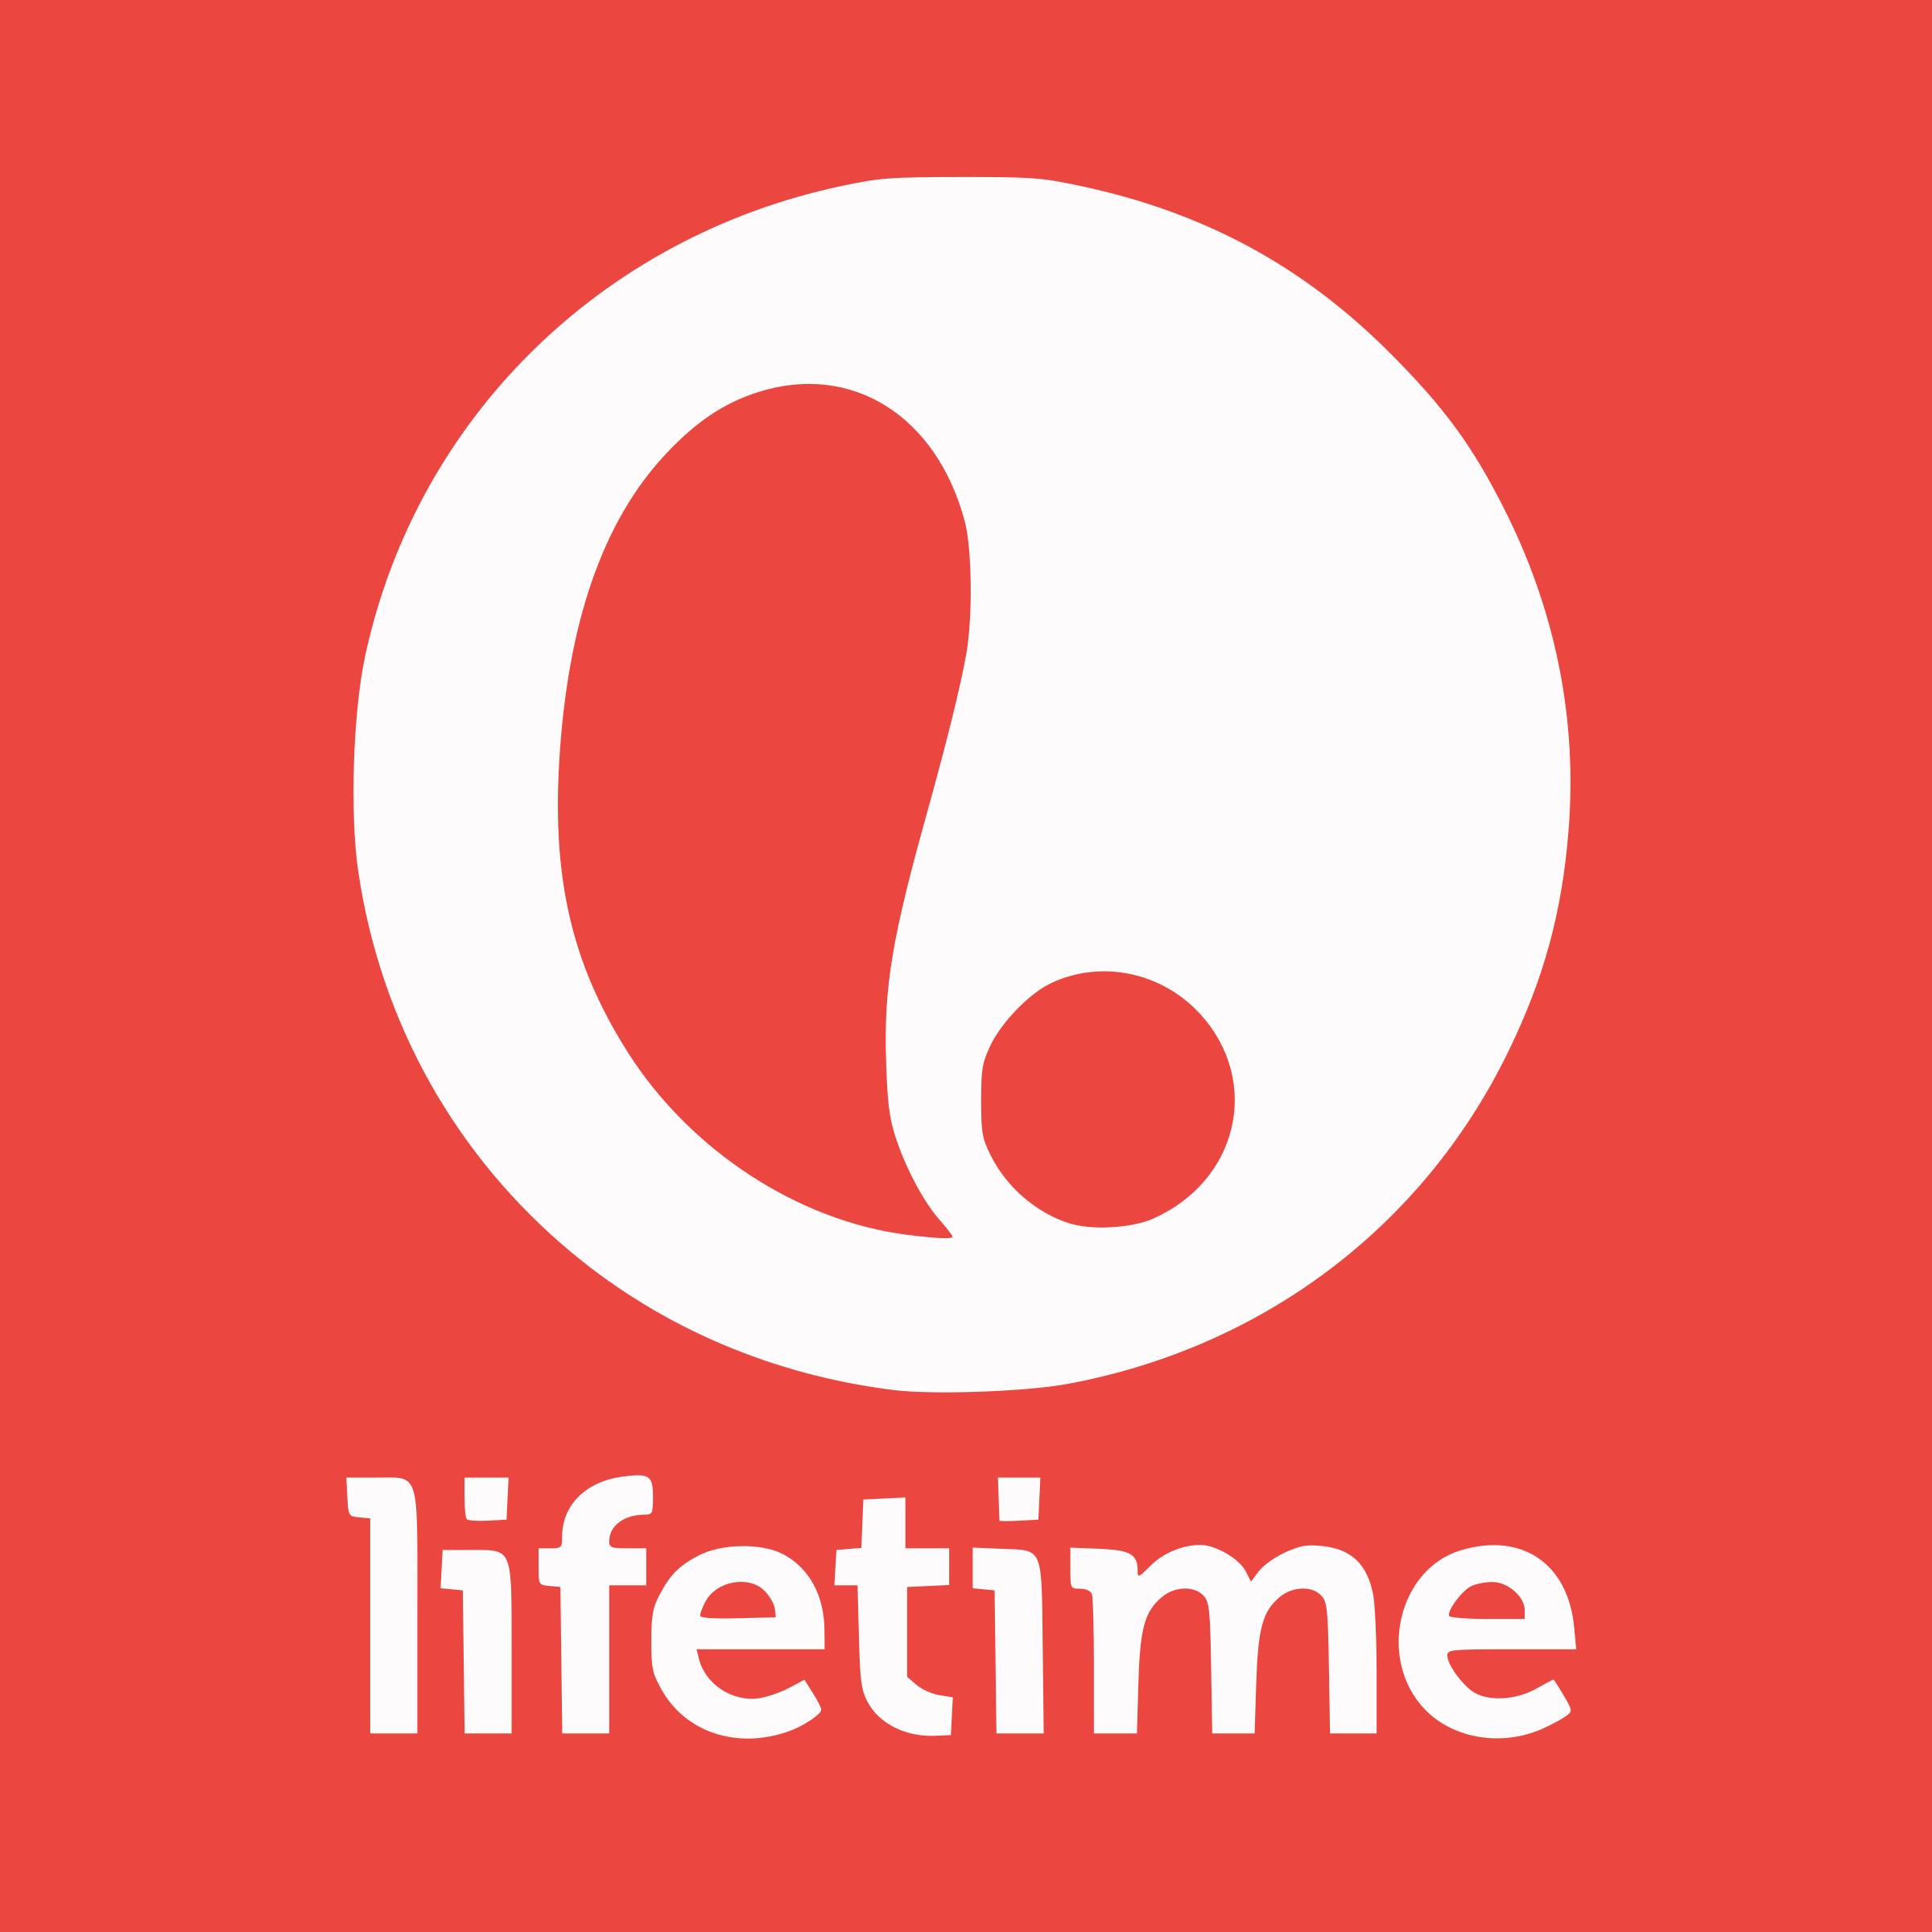 lifetime-2-logo-png-transparent.png